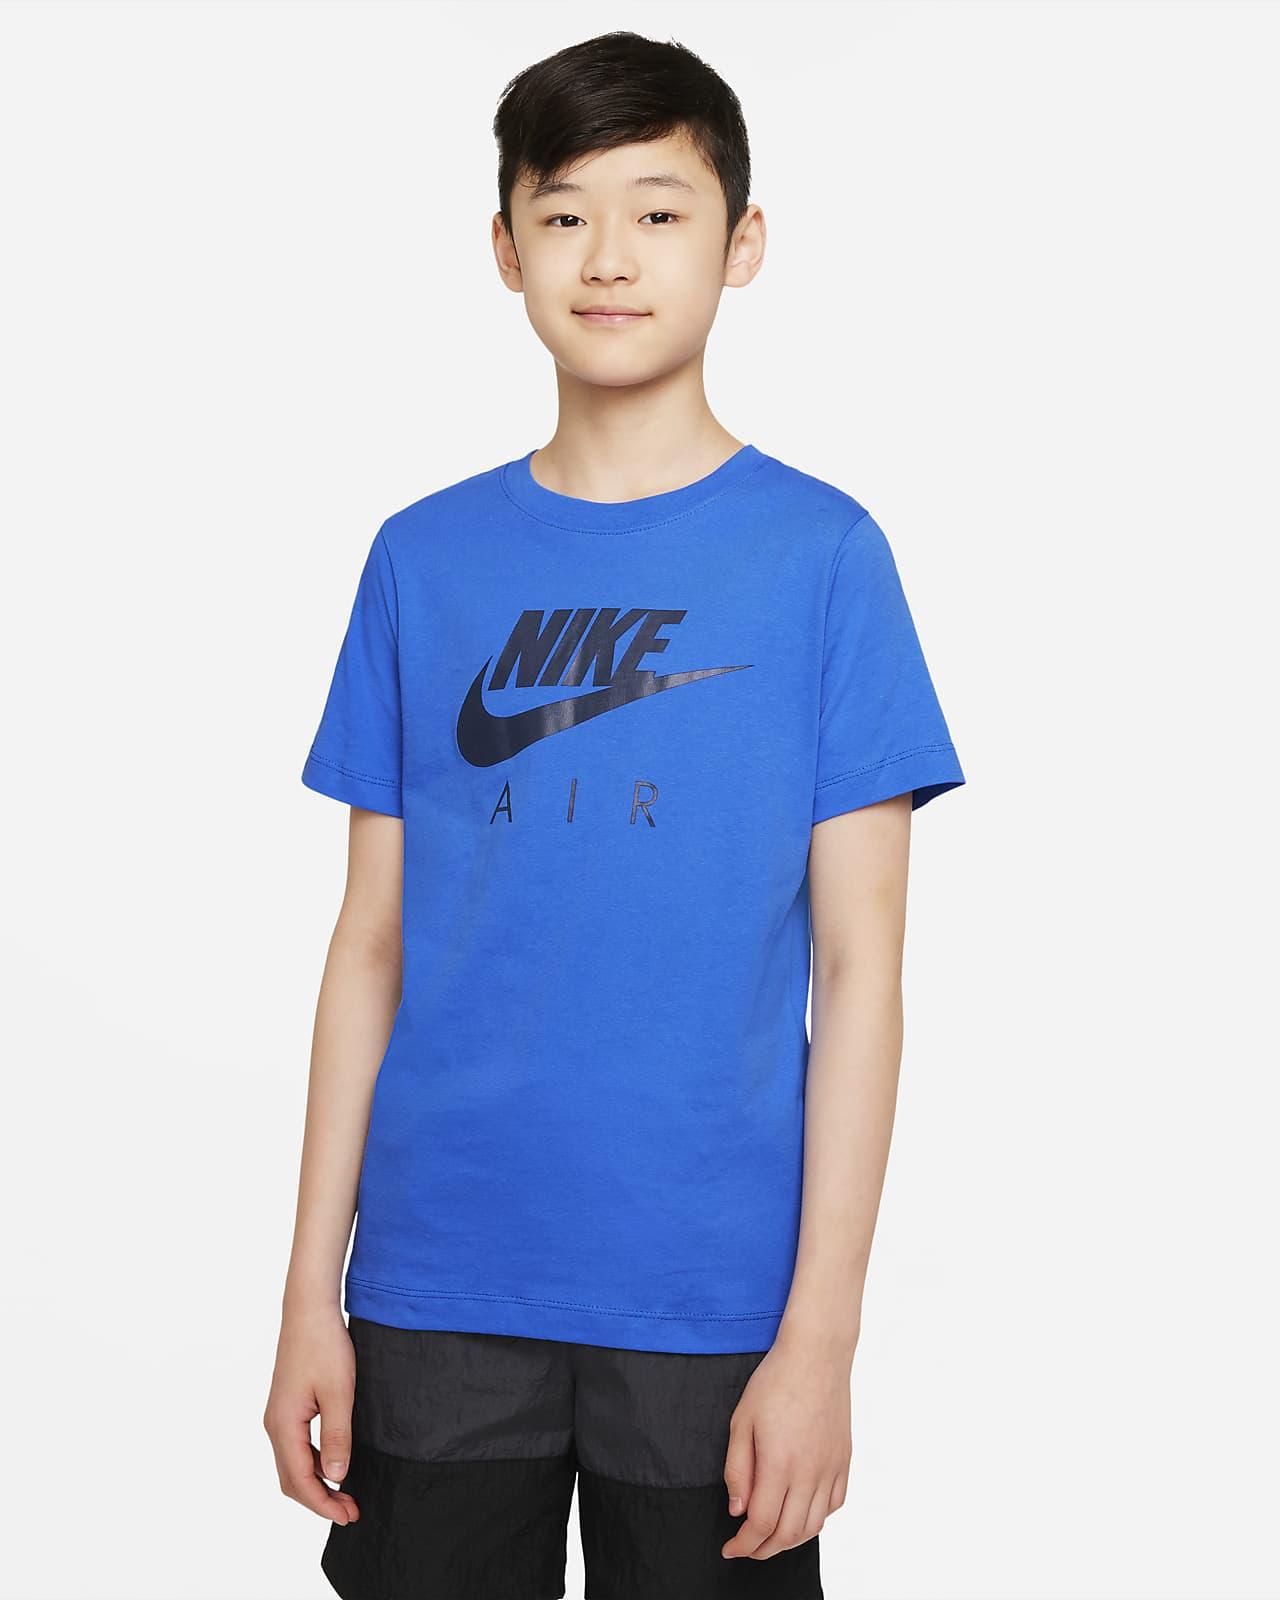 Playera Nike Air talla grande (para niños)